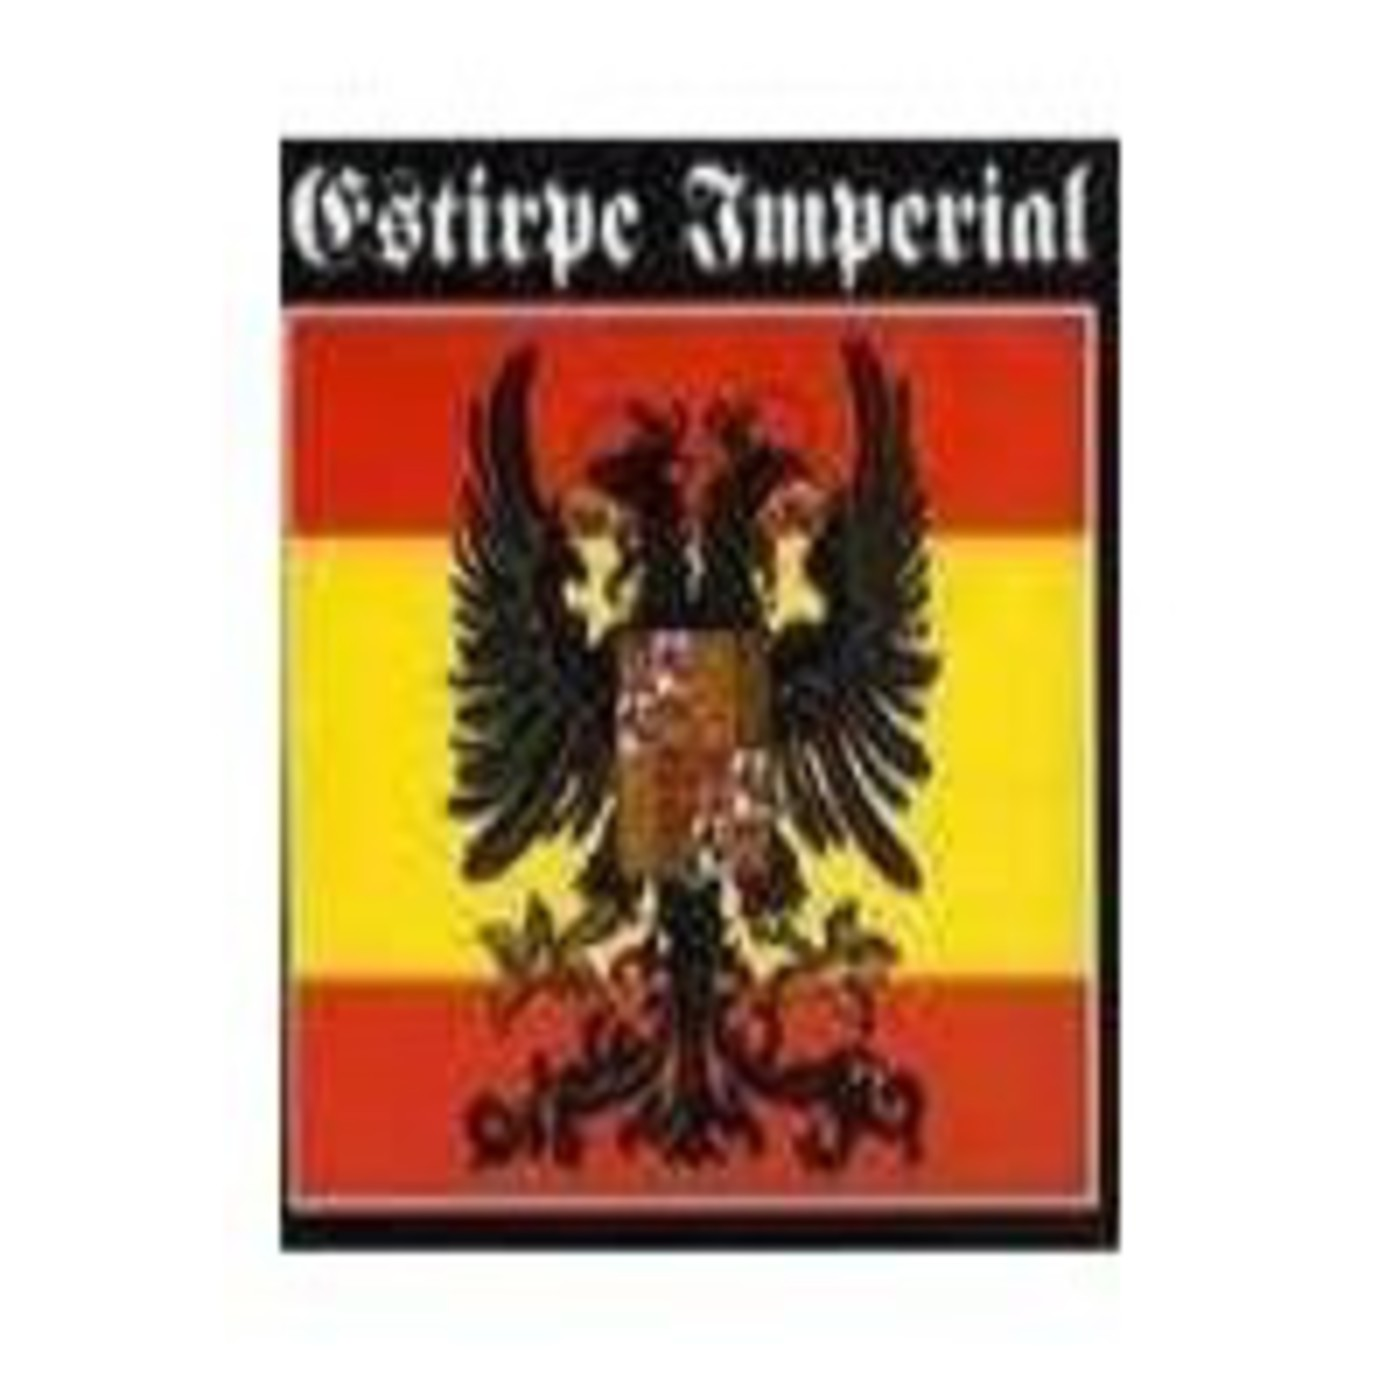 Salutacion a la bandera - Estirpe imperial